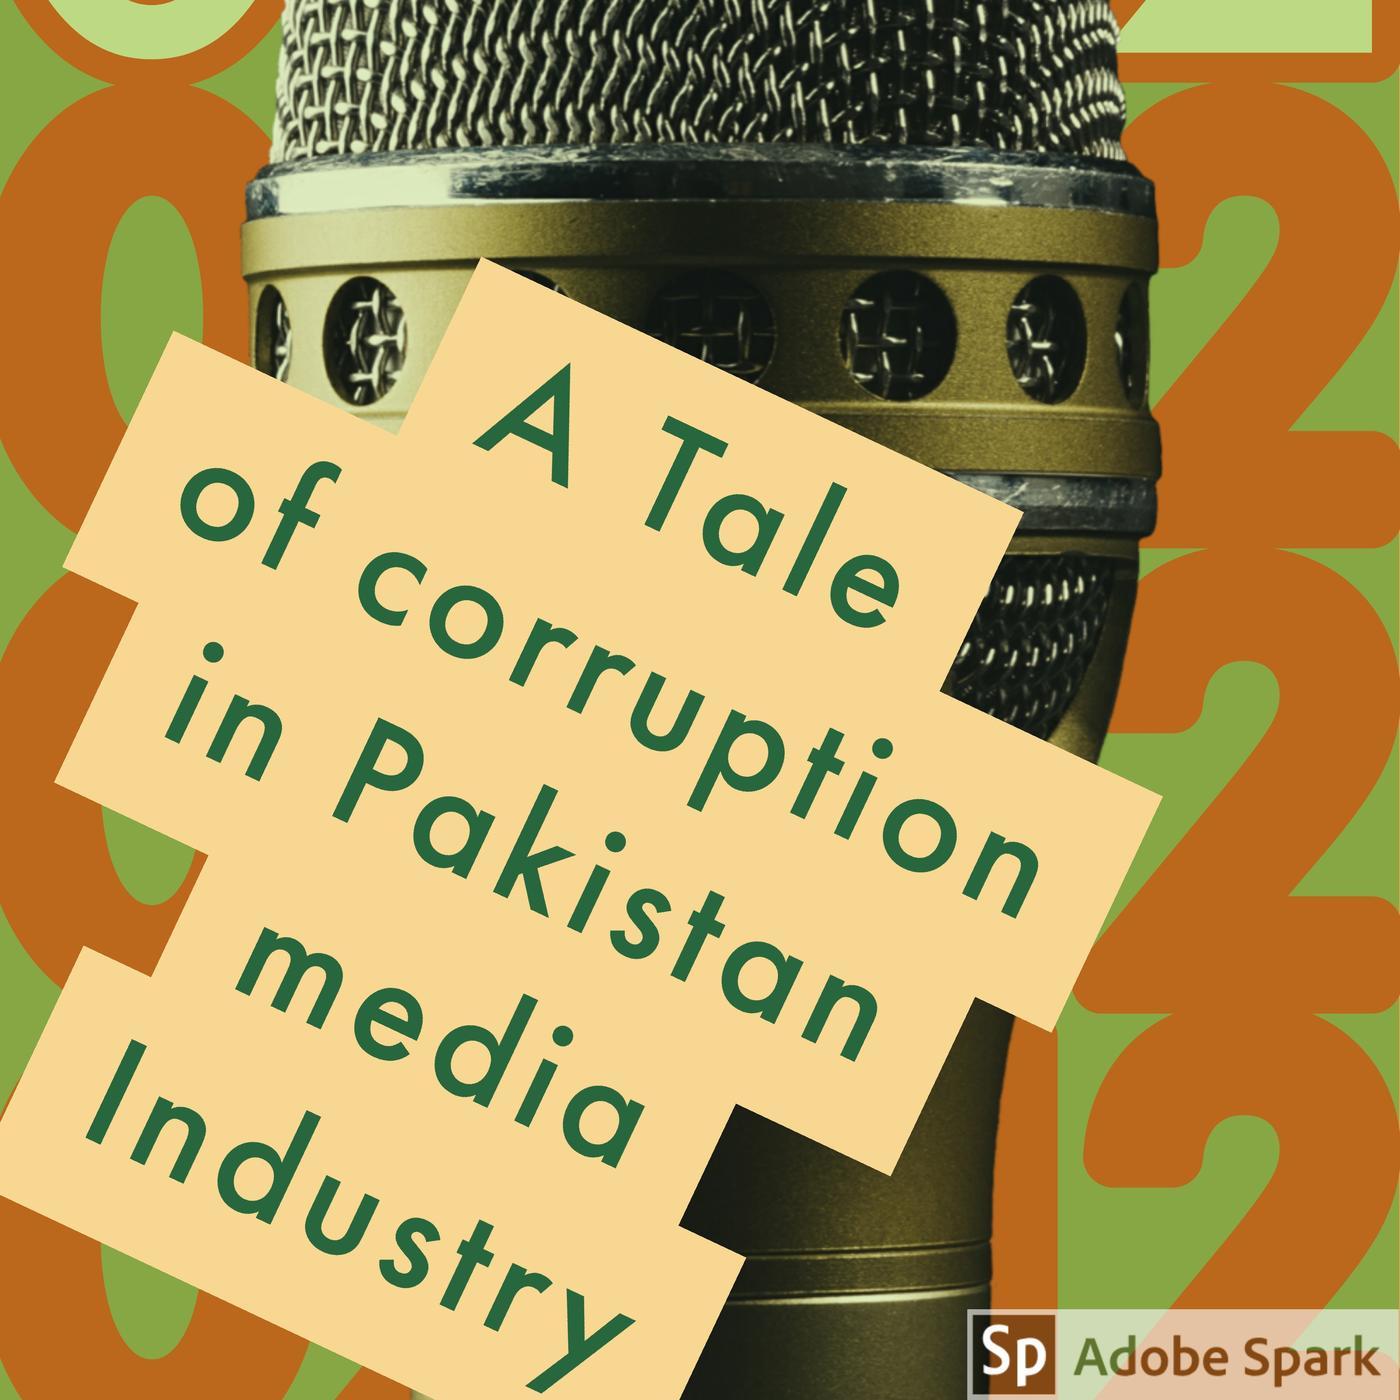 Reality of Pakistani News channels industry - Kashmir needs